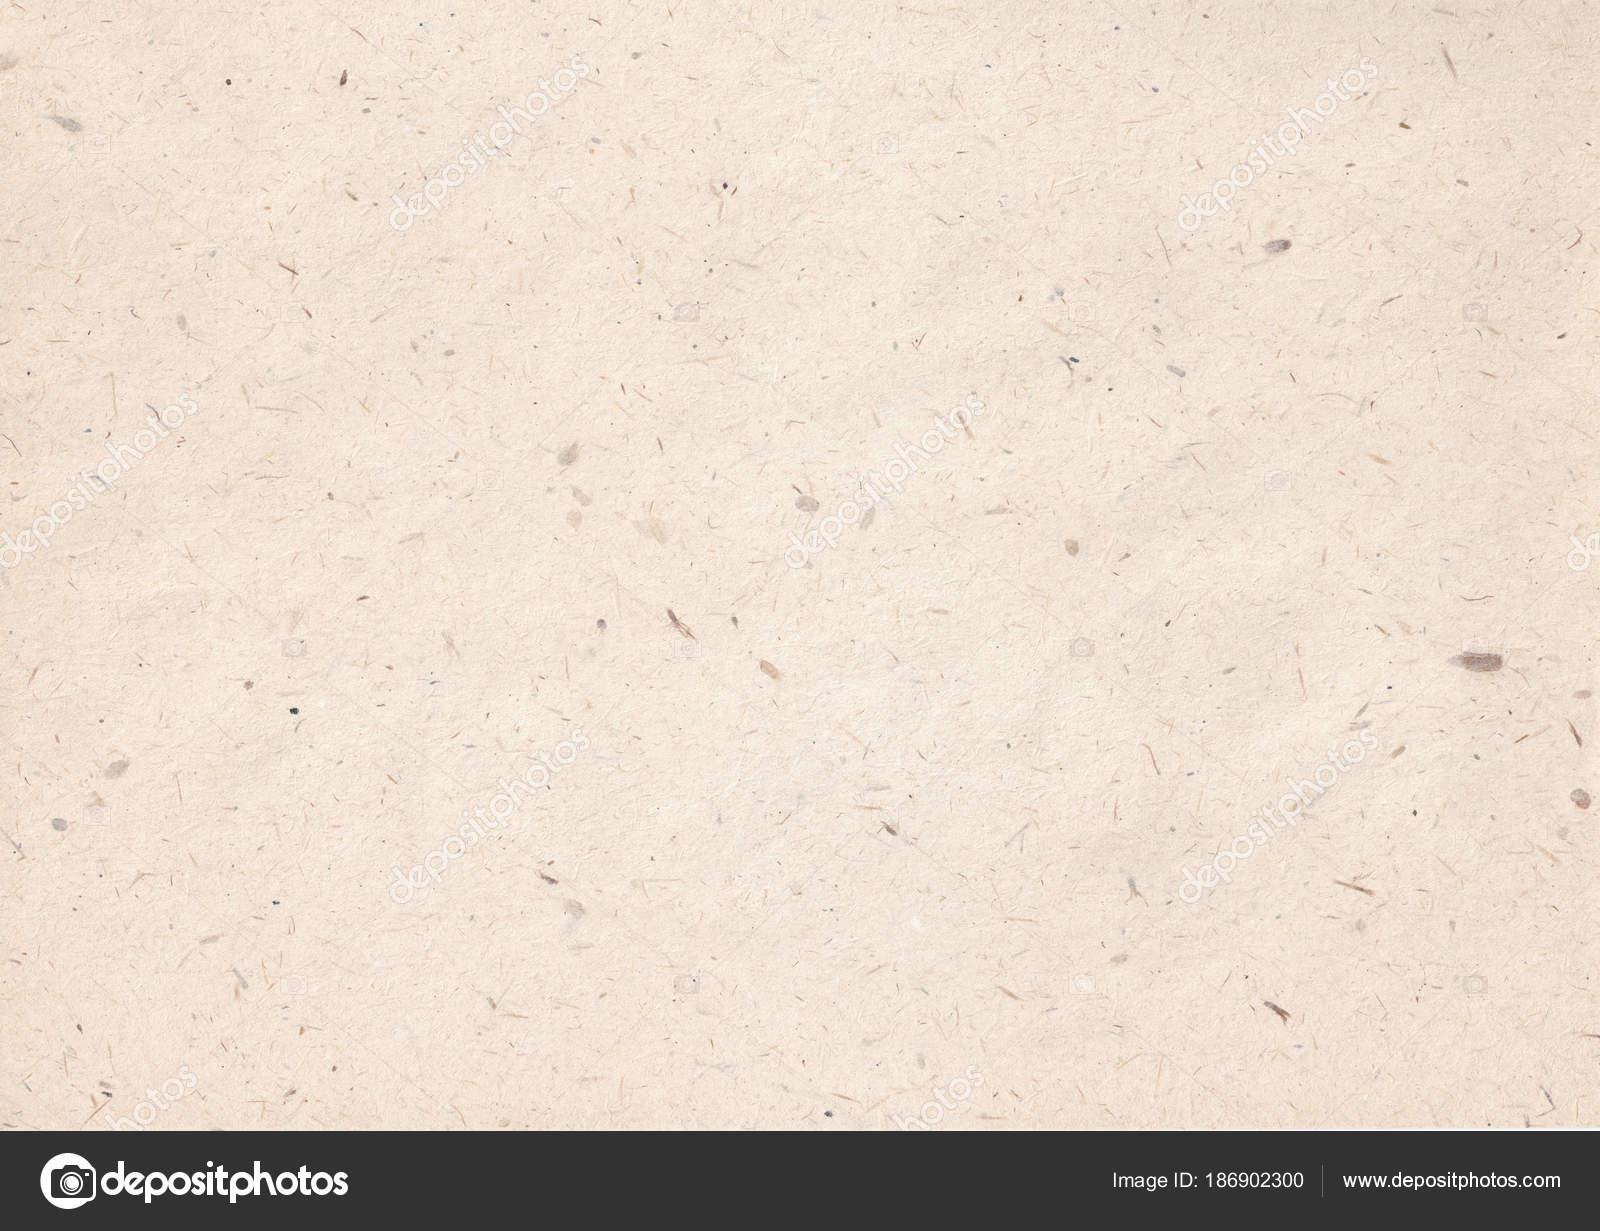 Texture Of Light Kraft Paper Sheet With Soft Dark Brown Grain Shavings Photo By Apagafonova